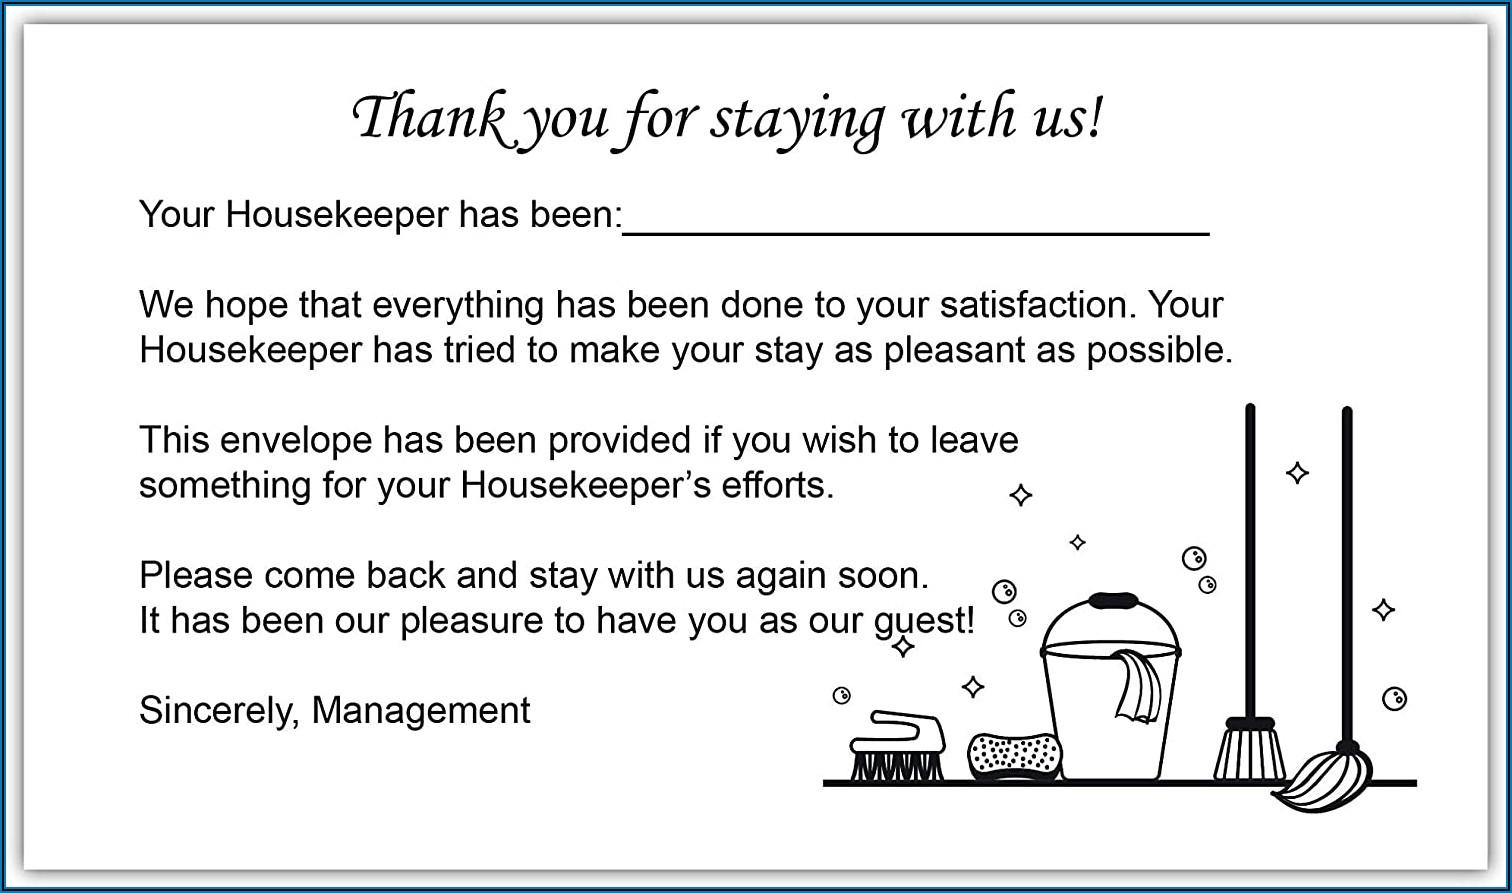 Hotel Housekeeping Tip Envelopes